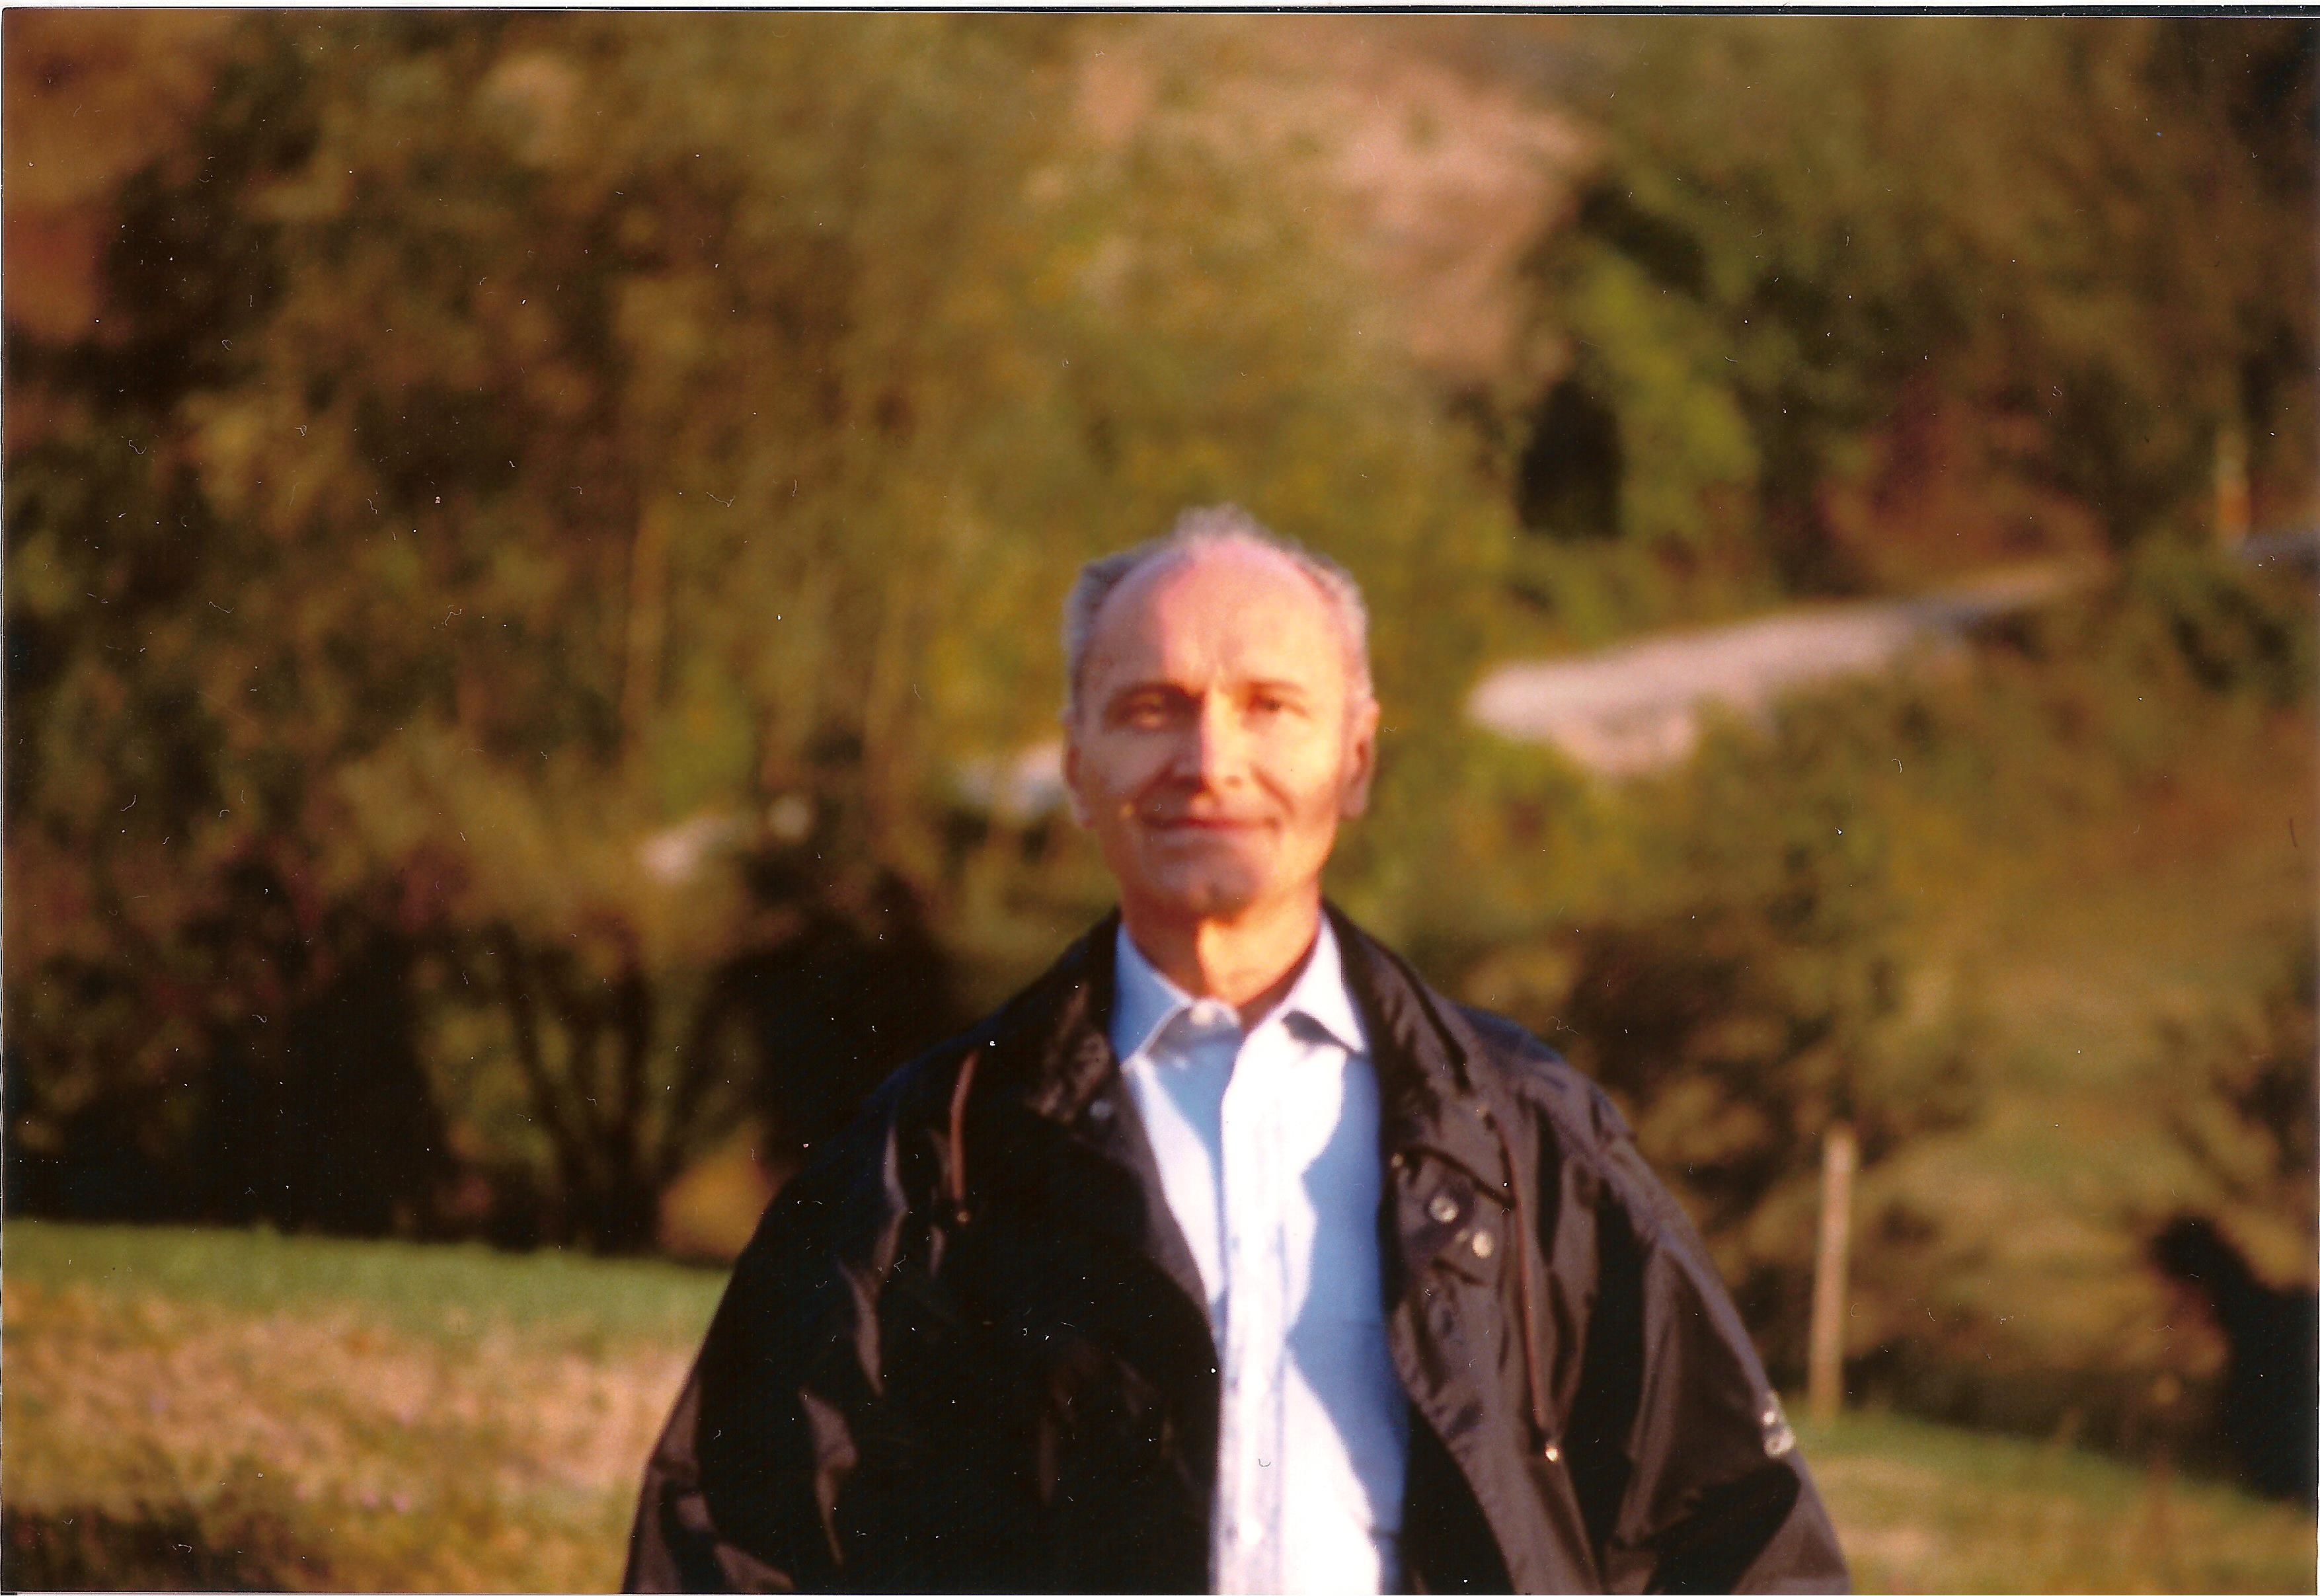 Maras nel 1997